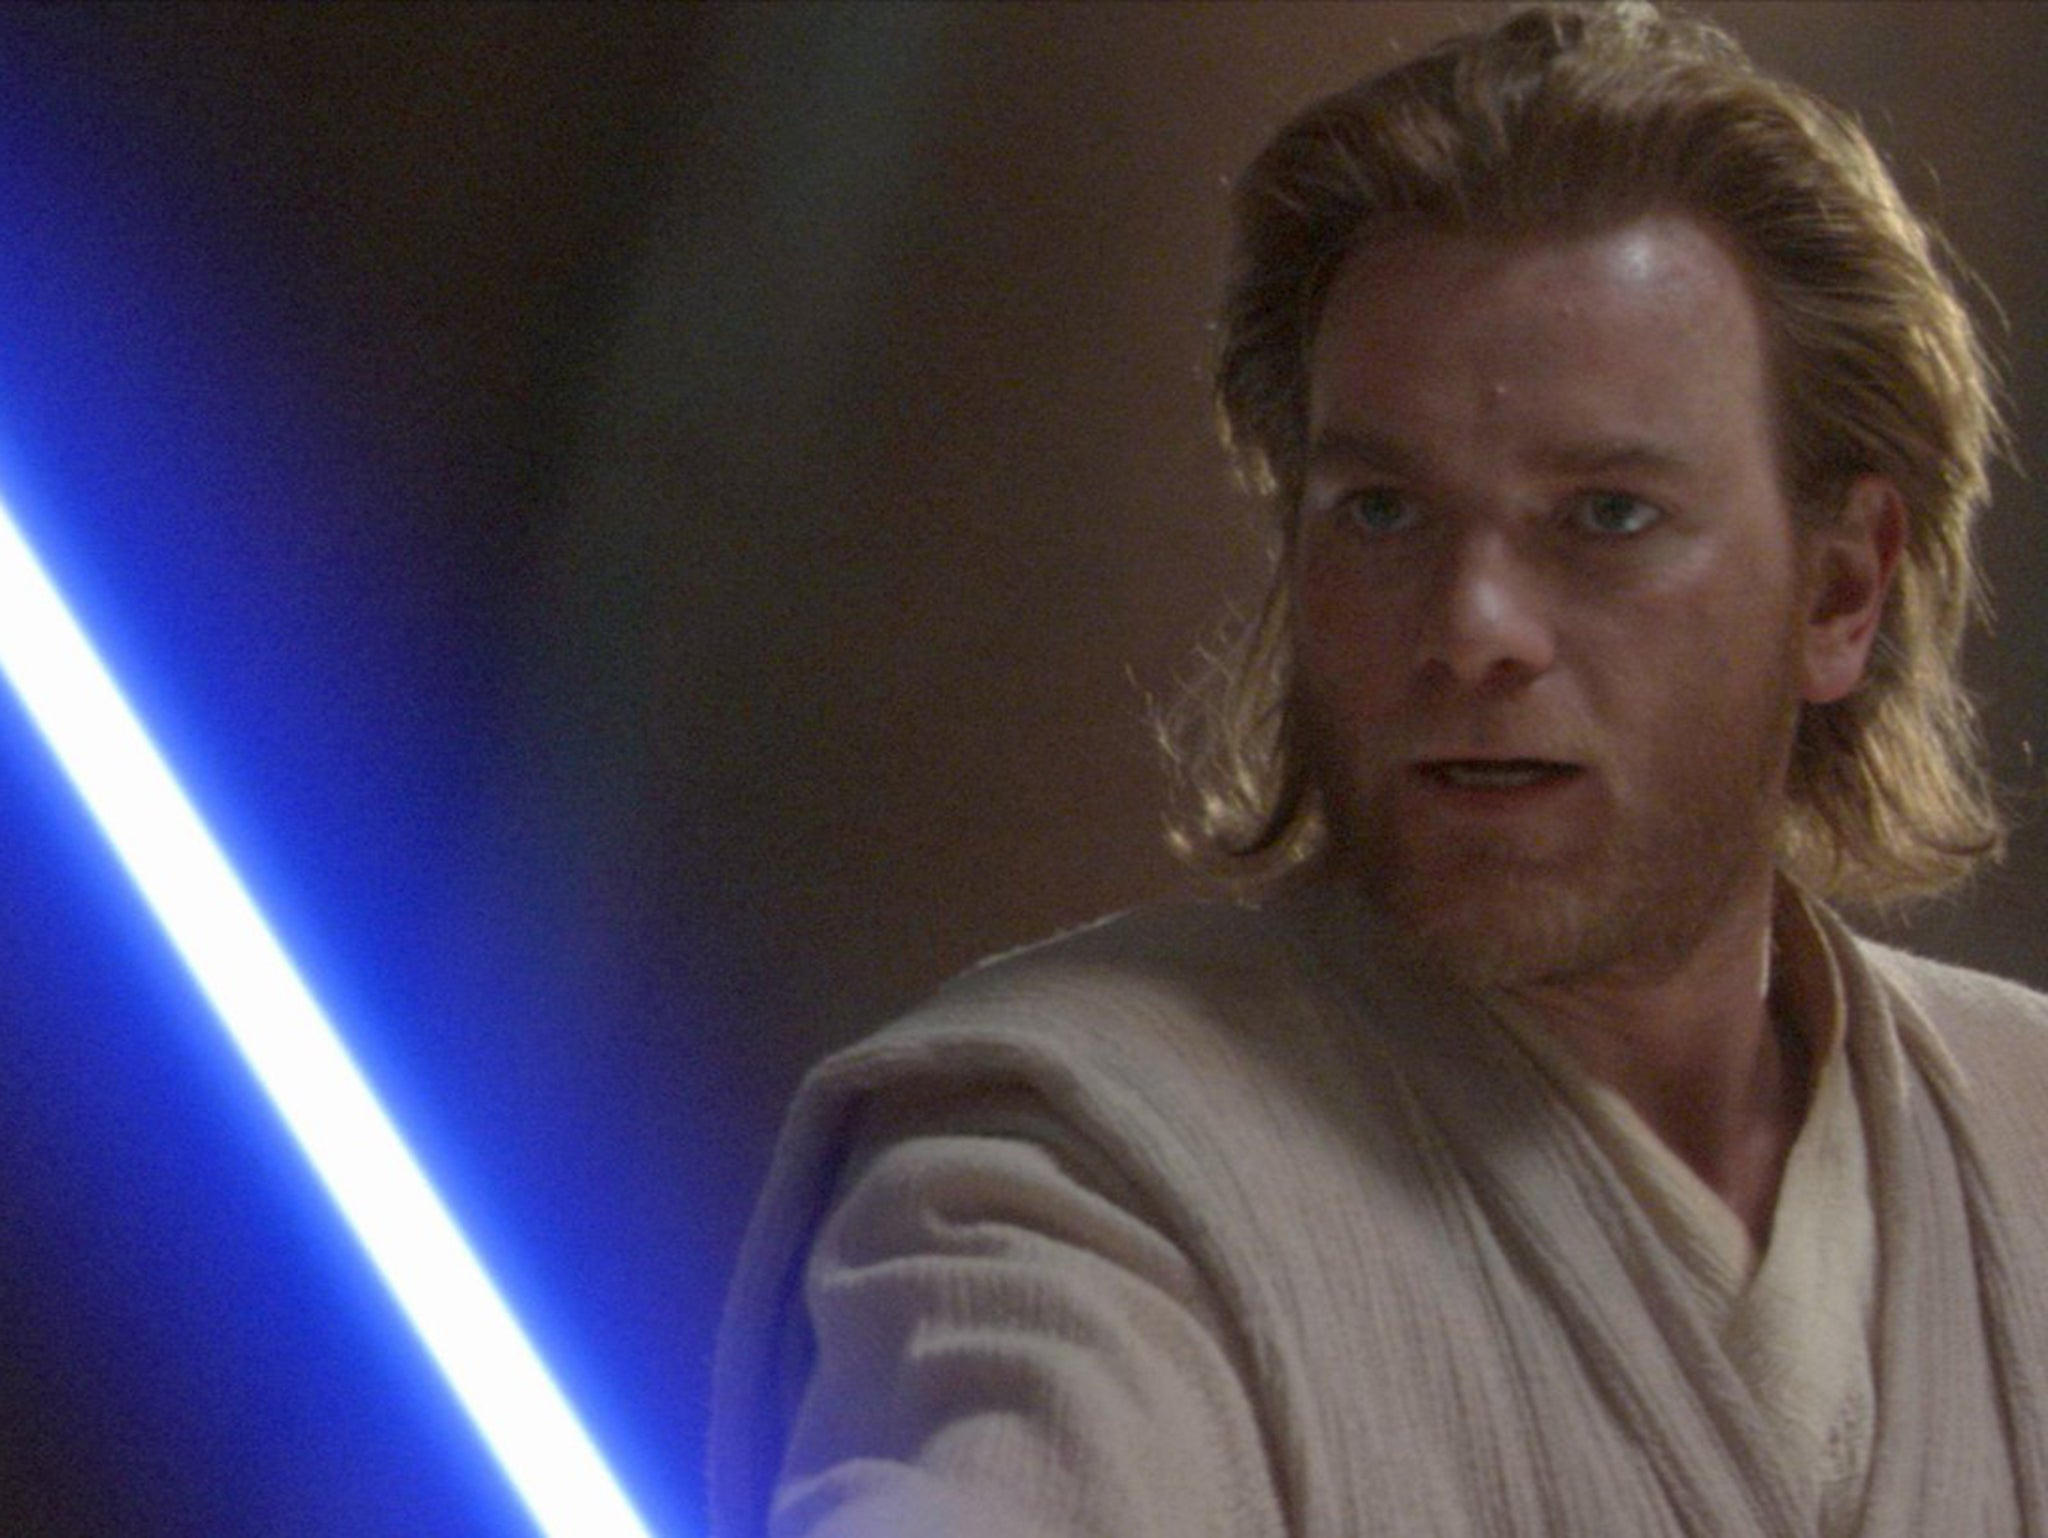 Star Wars: Ewan McGregor set to return as Obi-Wan Kenobi in new Disney series